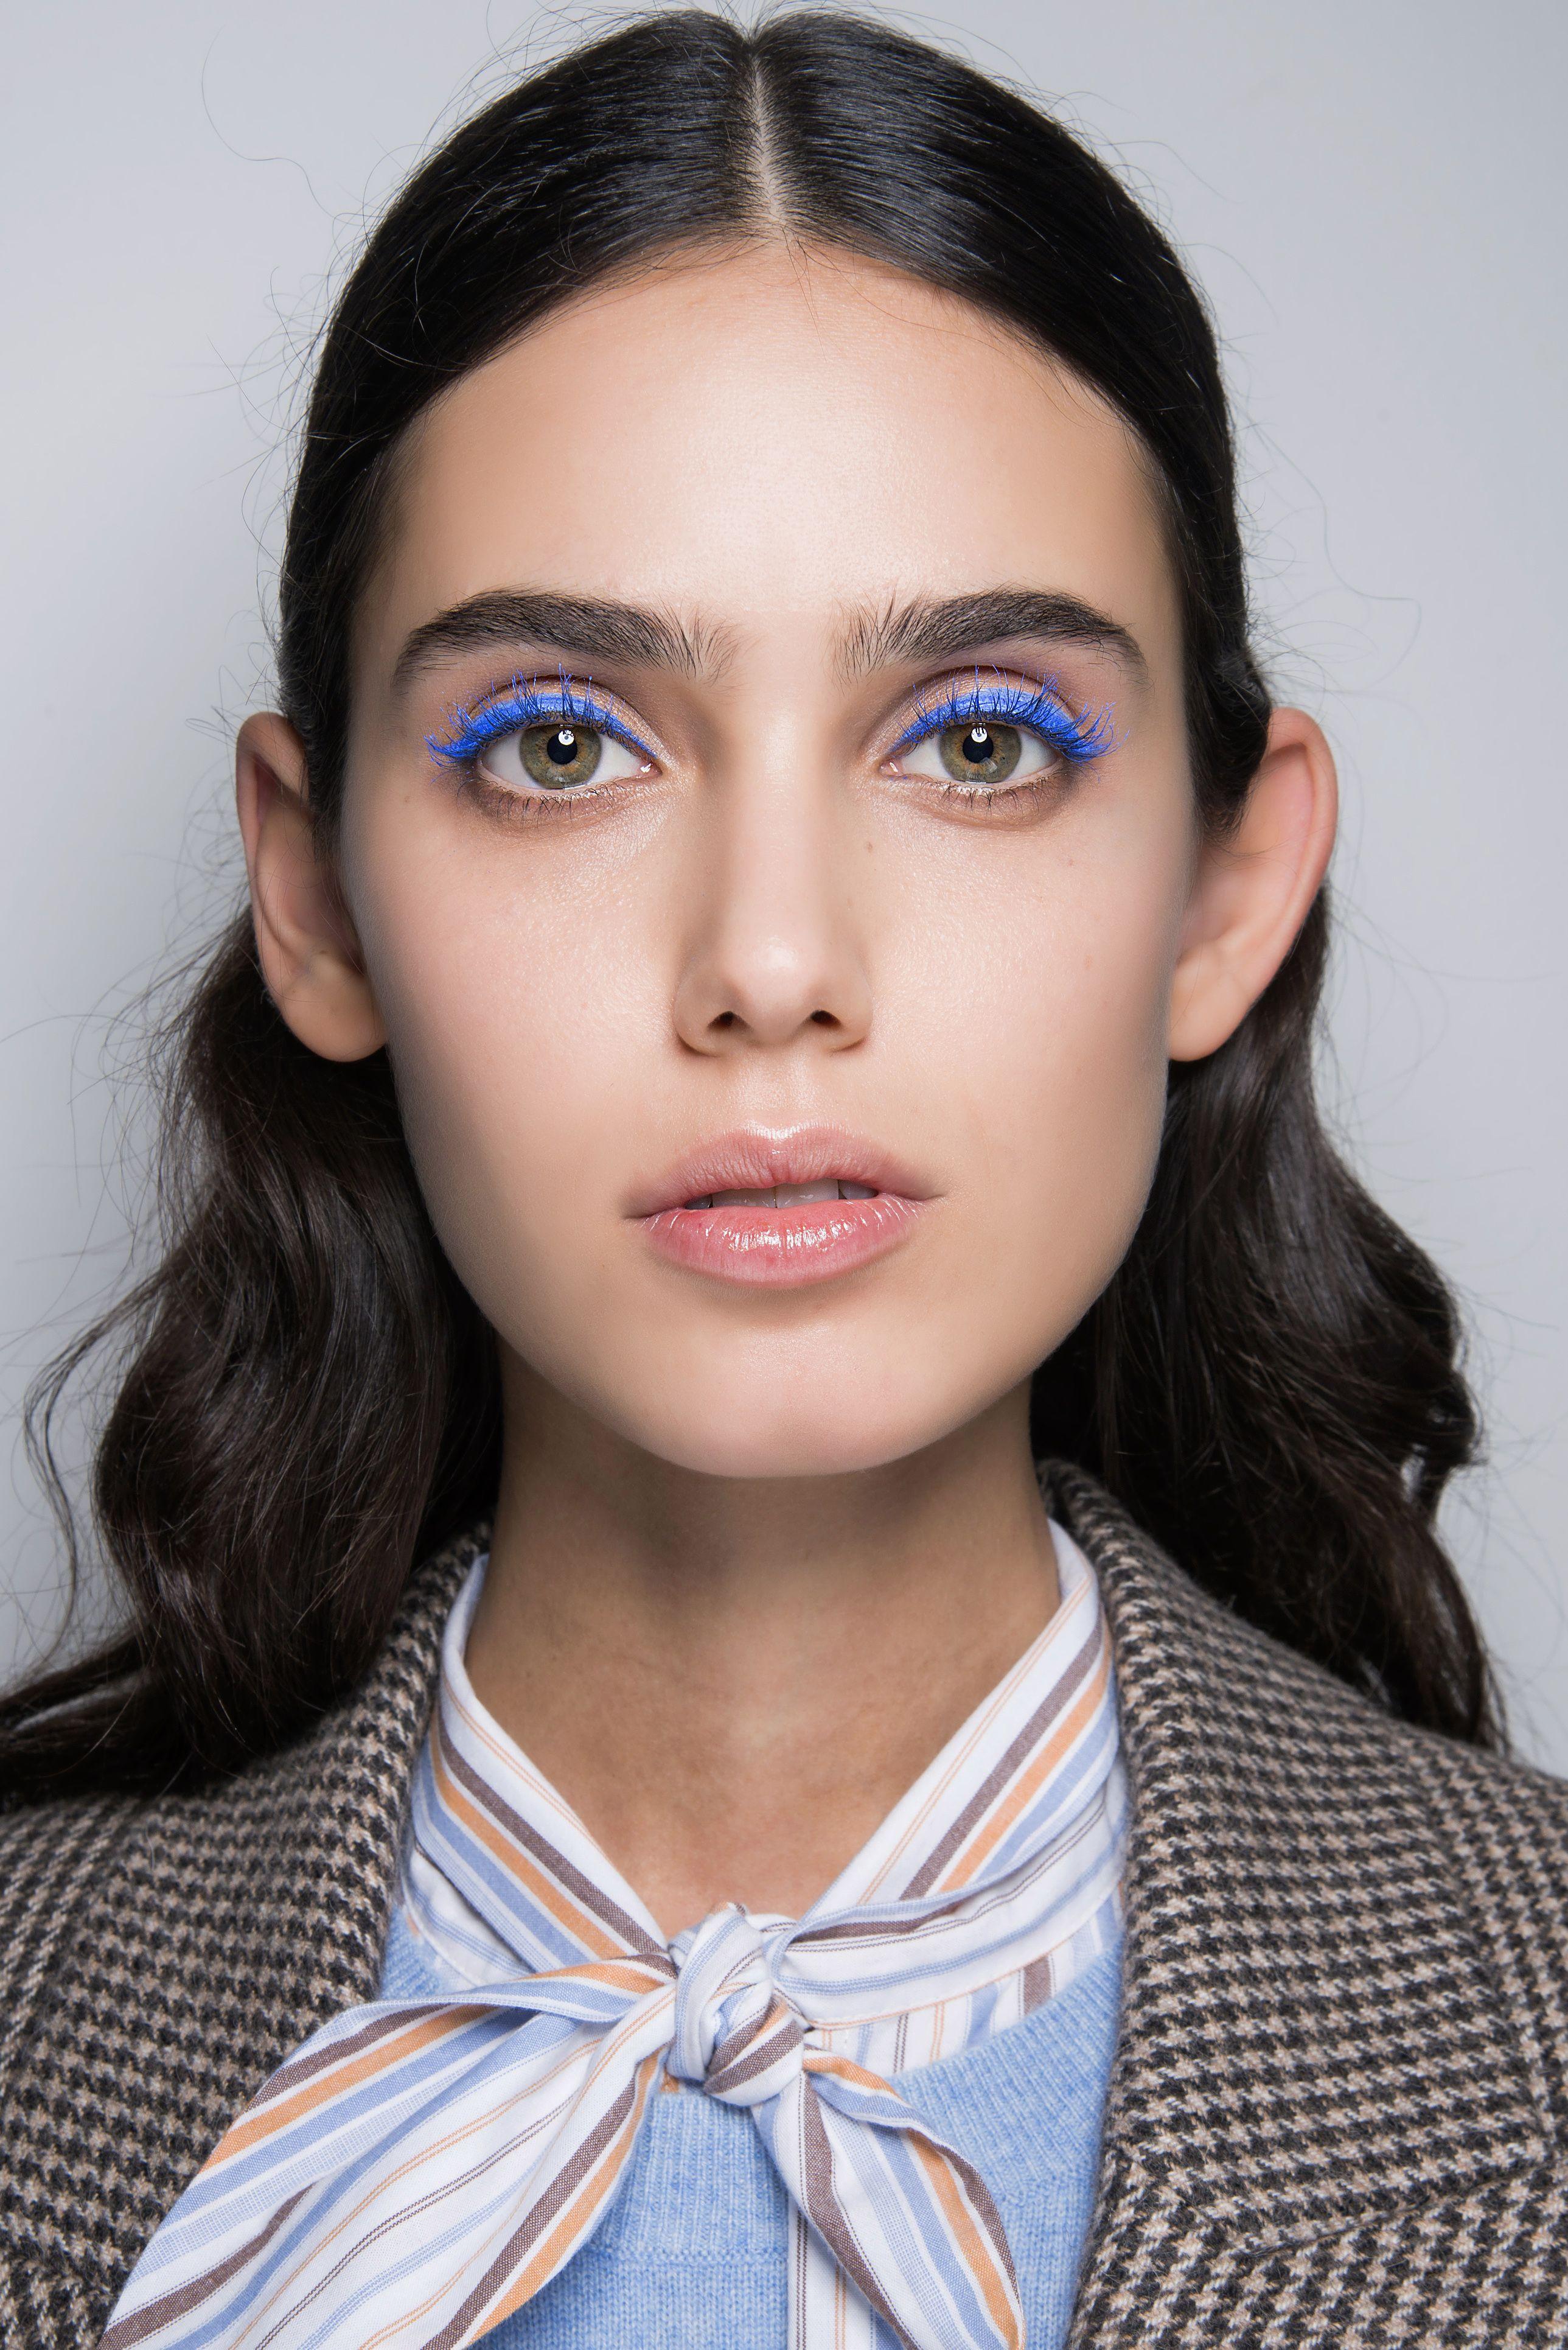 Makeup models 2020! Trends in face, lip, eye makeup! in